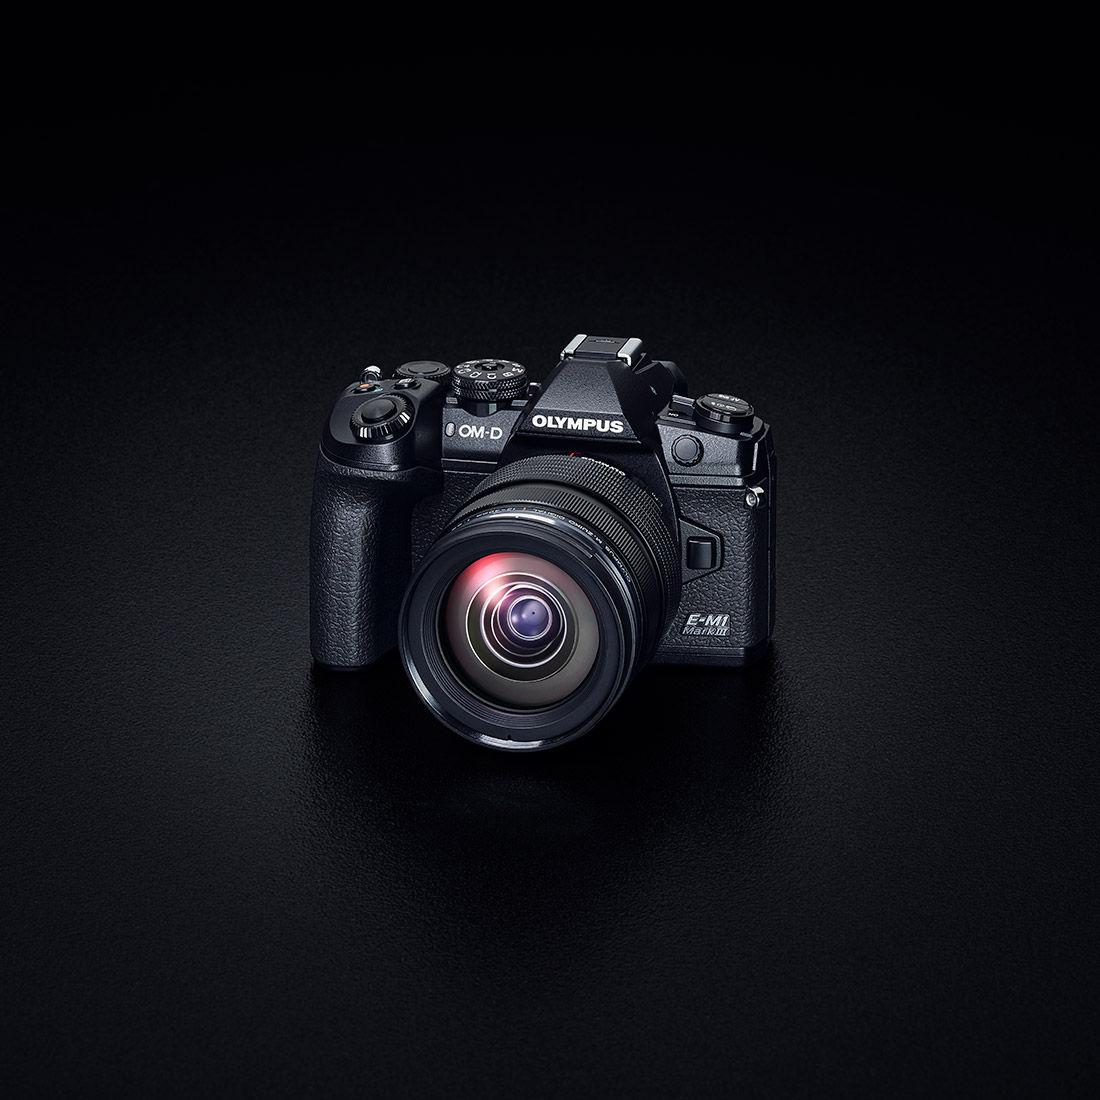 Product image of camera on black background